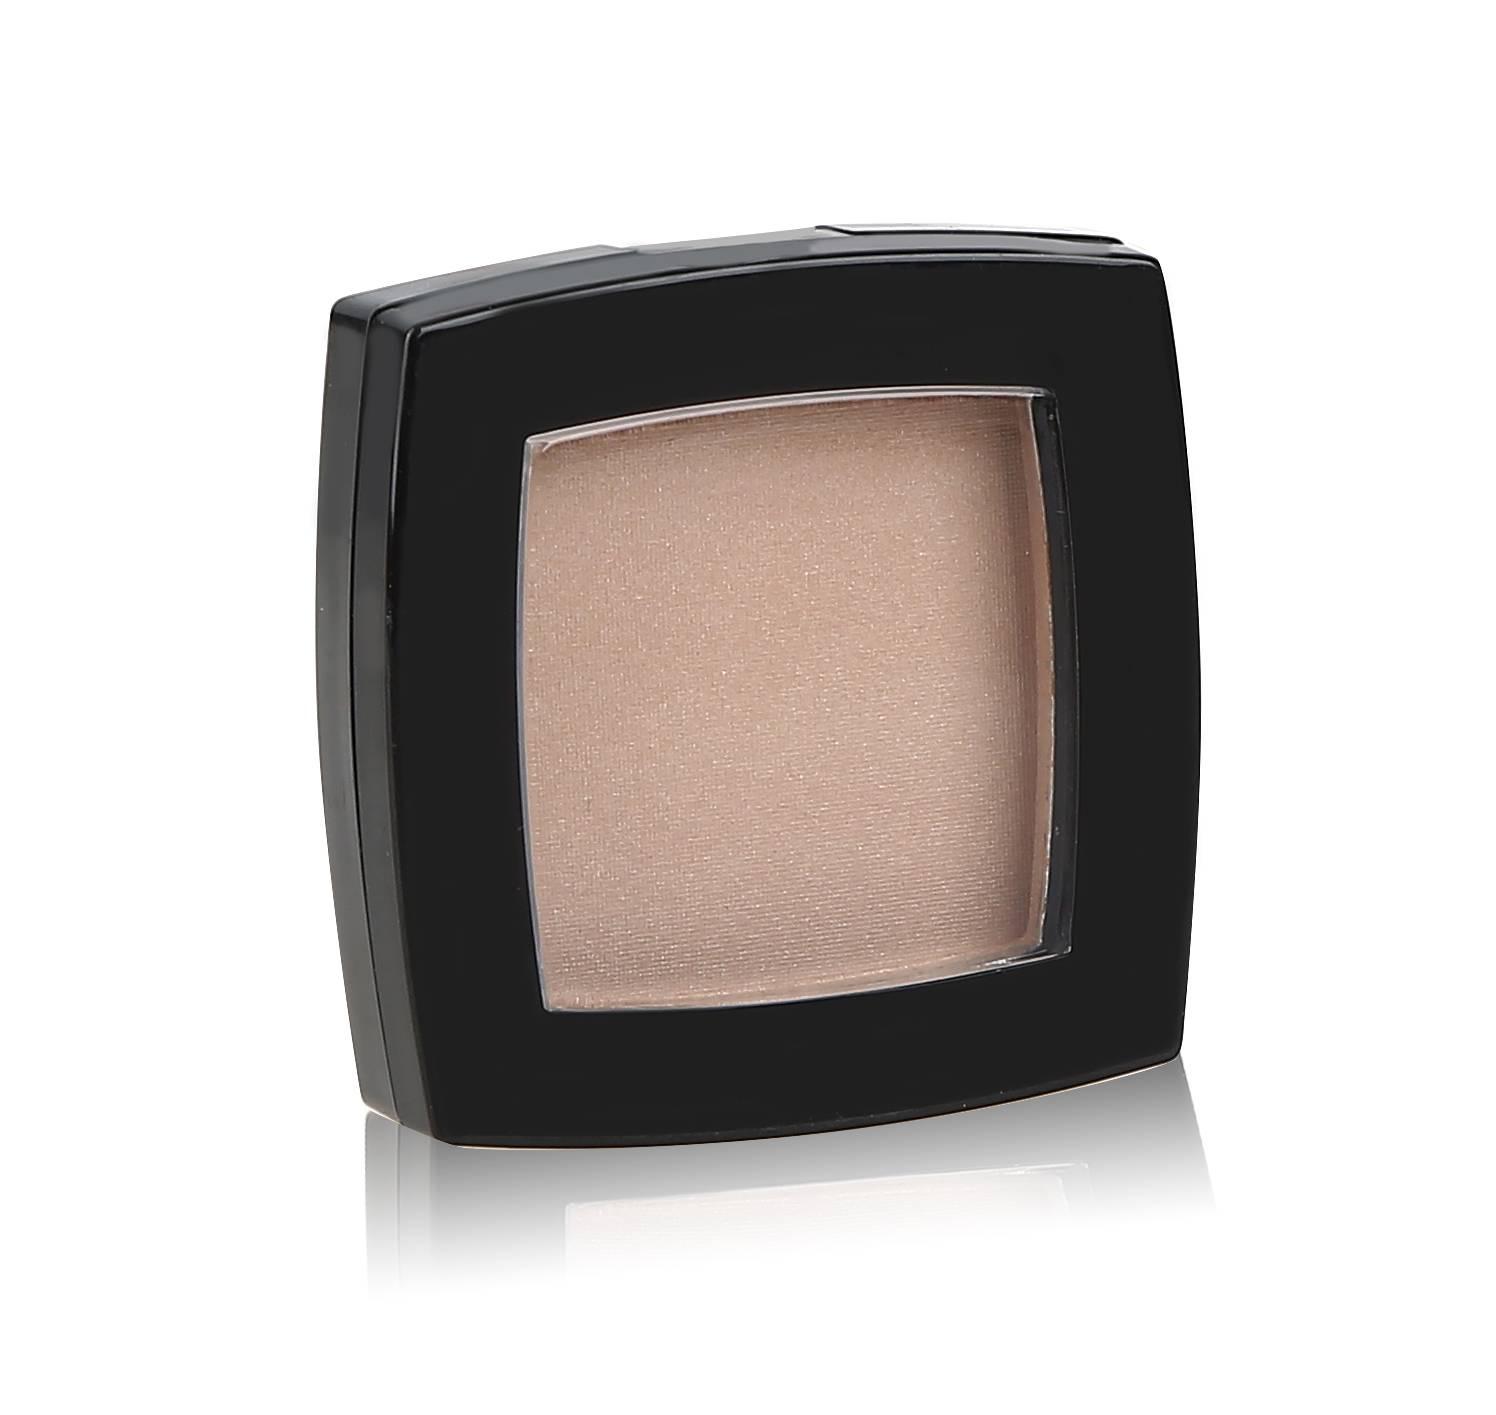 Single Matte Color Compact Powder